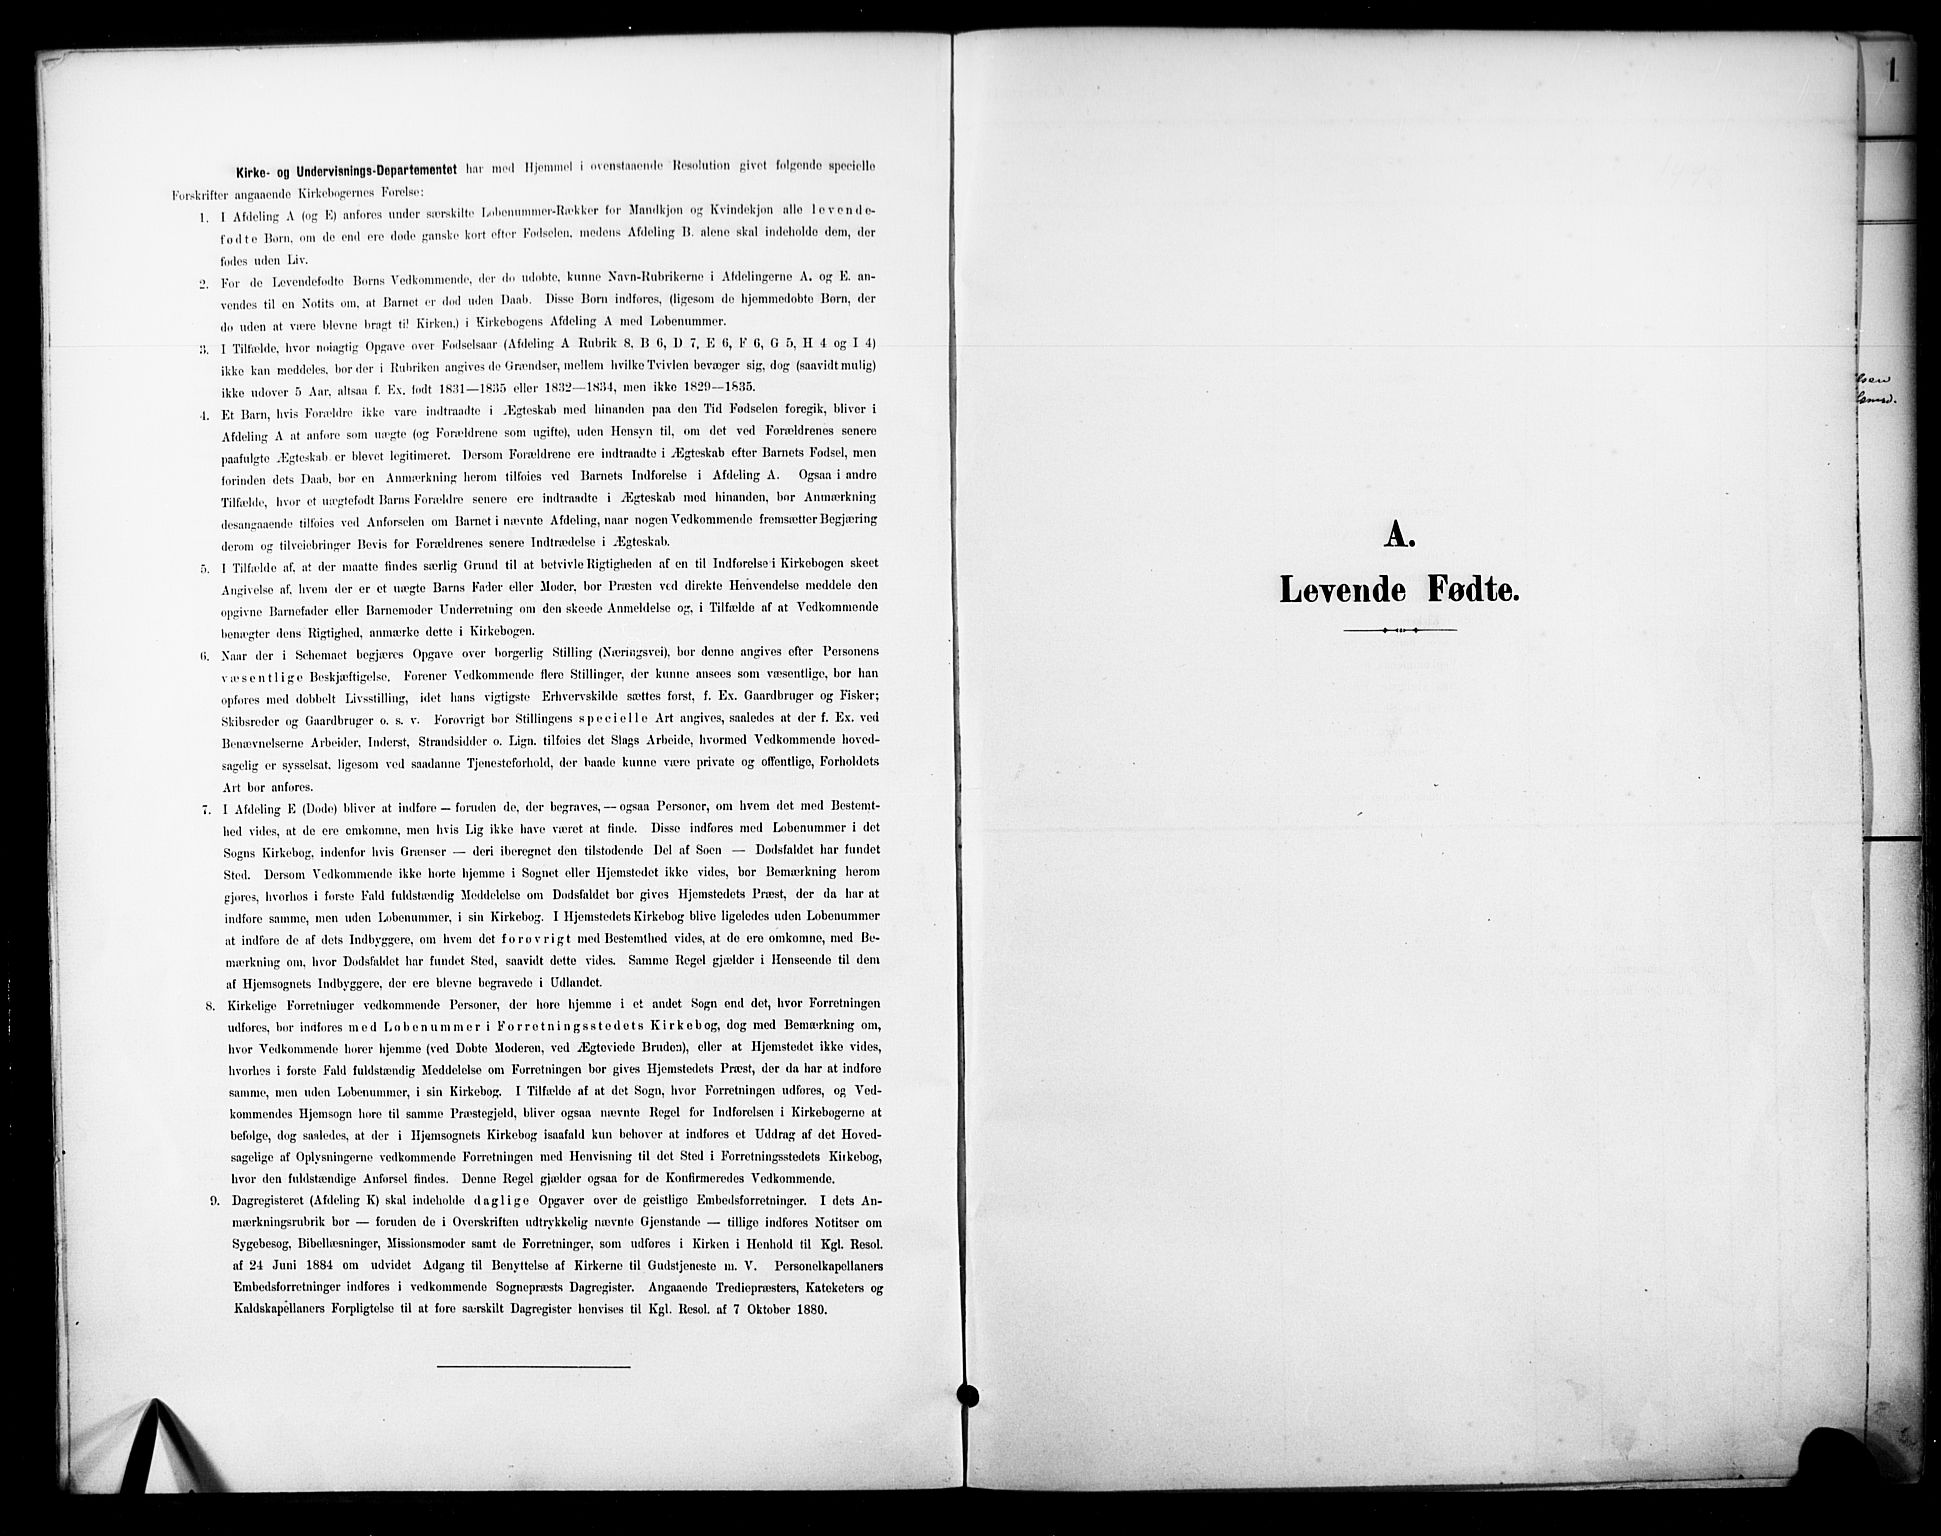 SAKO, Nore kirkebøker, F/Fc/L0005: Ministerialbok nr. III 5, 1898-1922